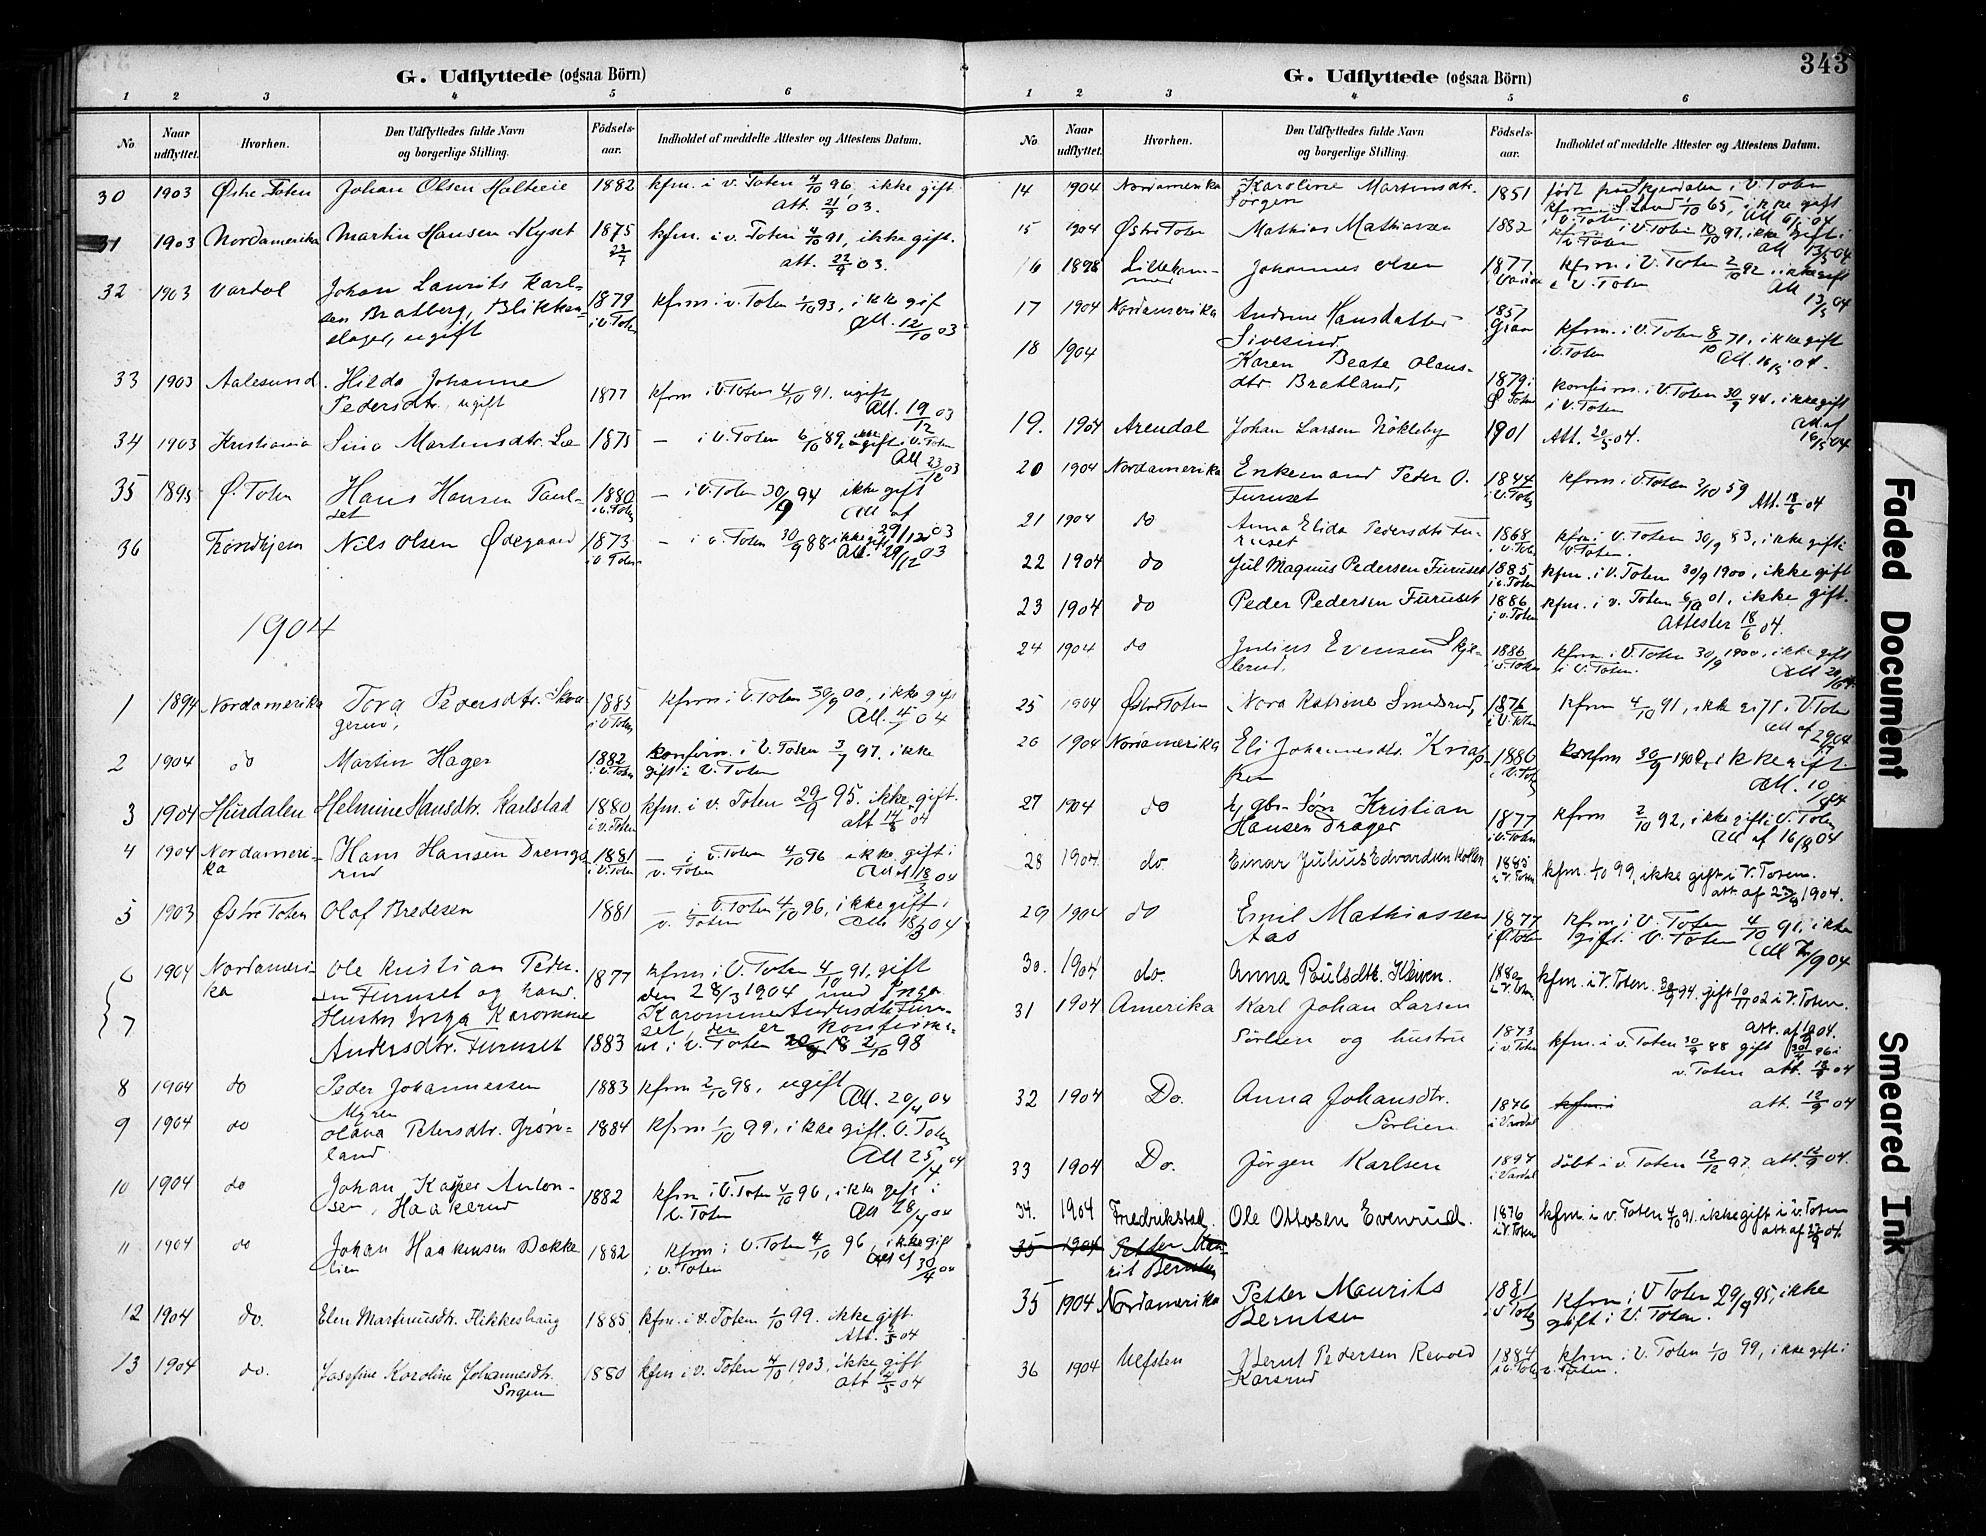 SAH, Vestre Toten prestekontor, H/Ha/Haa/L0011: Ministerialbok nr. 11, 1895-1906, s. 343